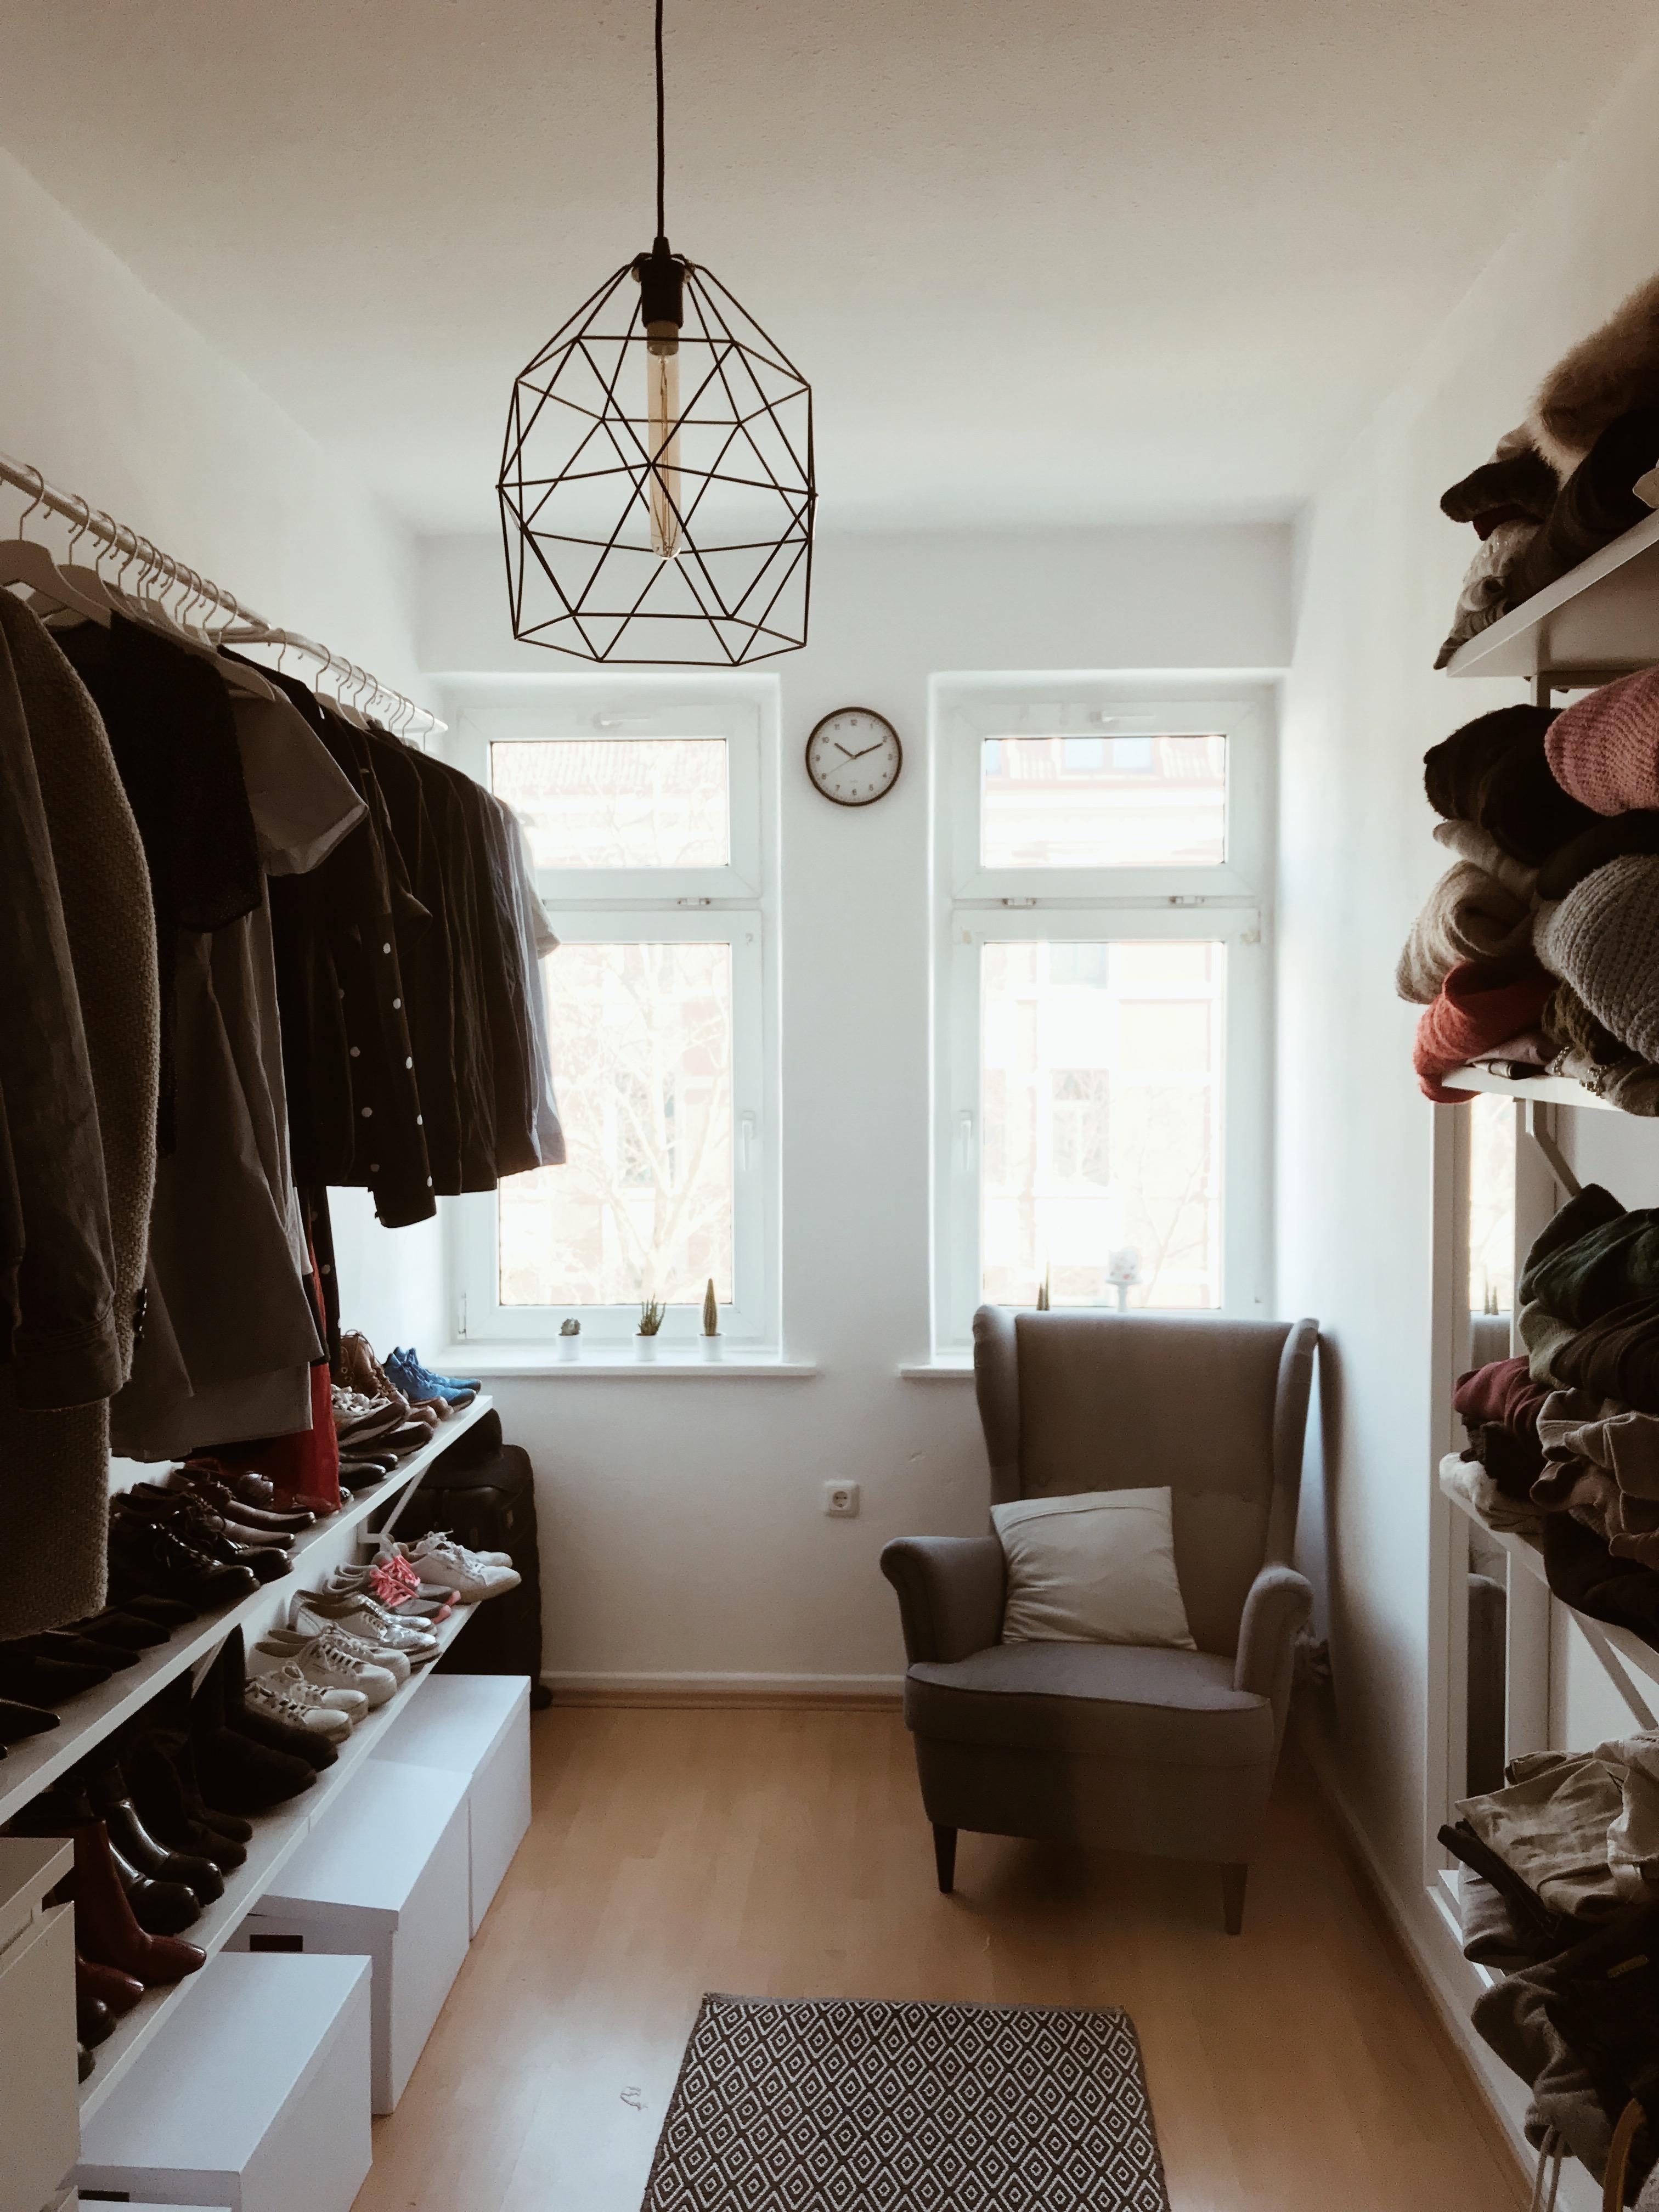 Begehbarer Kleiderschrank Ideen So Gehts